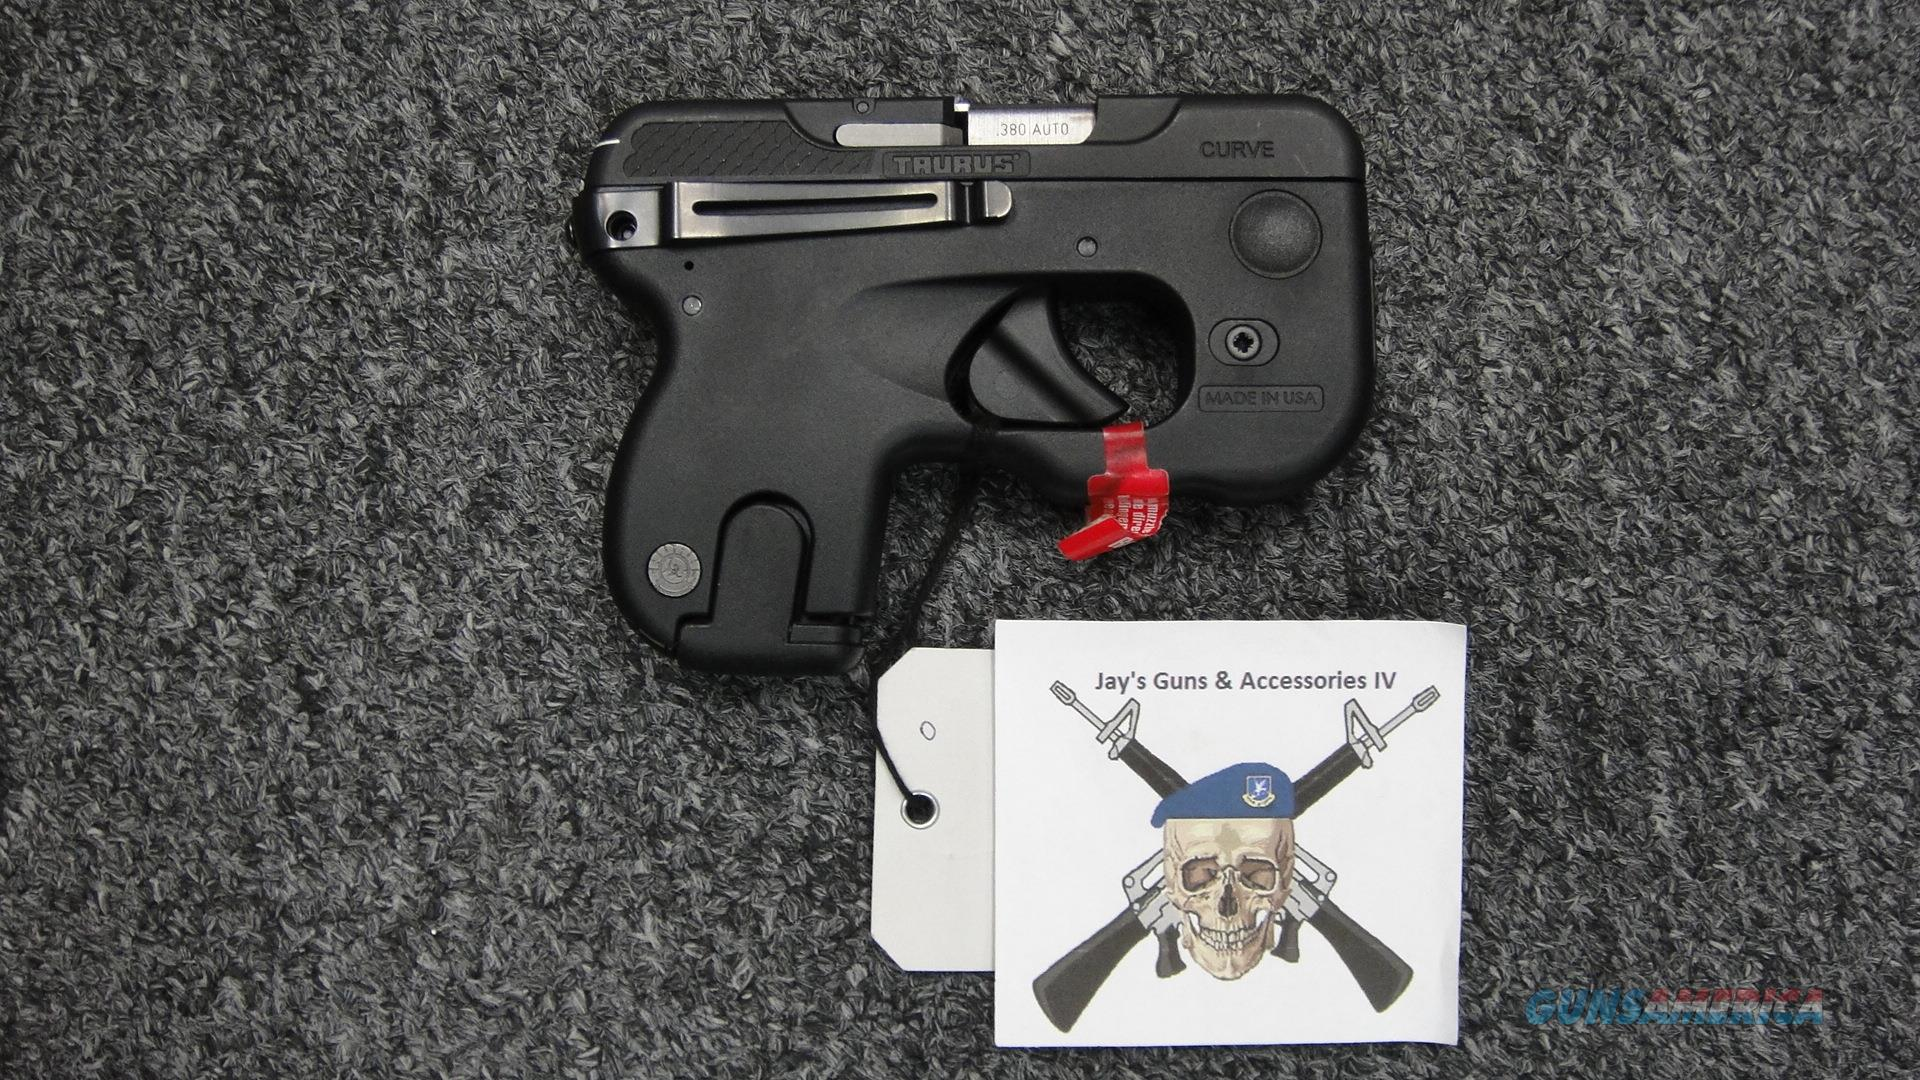 Taurus Curve .380ACP (No light/laser option)  Guns > Pistols > Taurus Pistols > Semi Auto Pistols > Polymer Frame